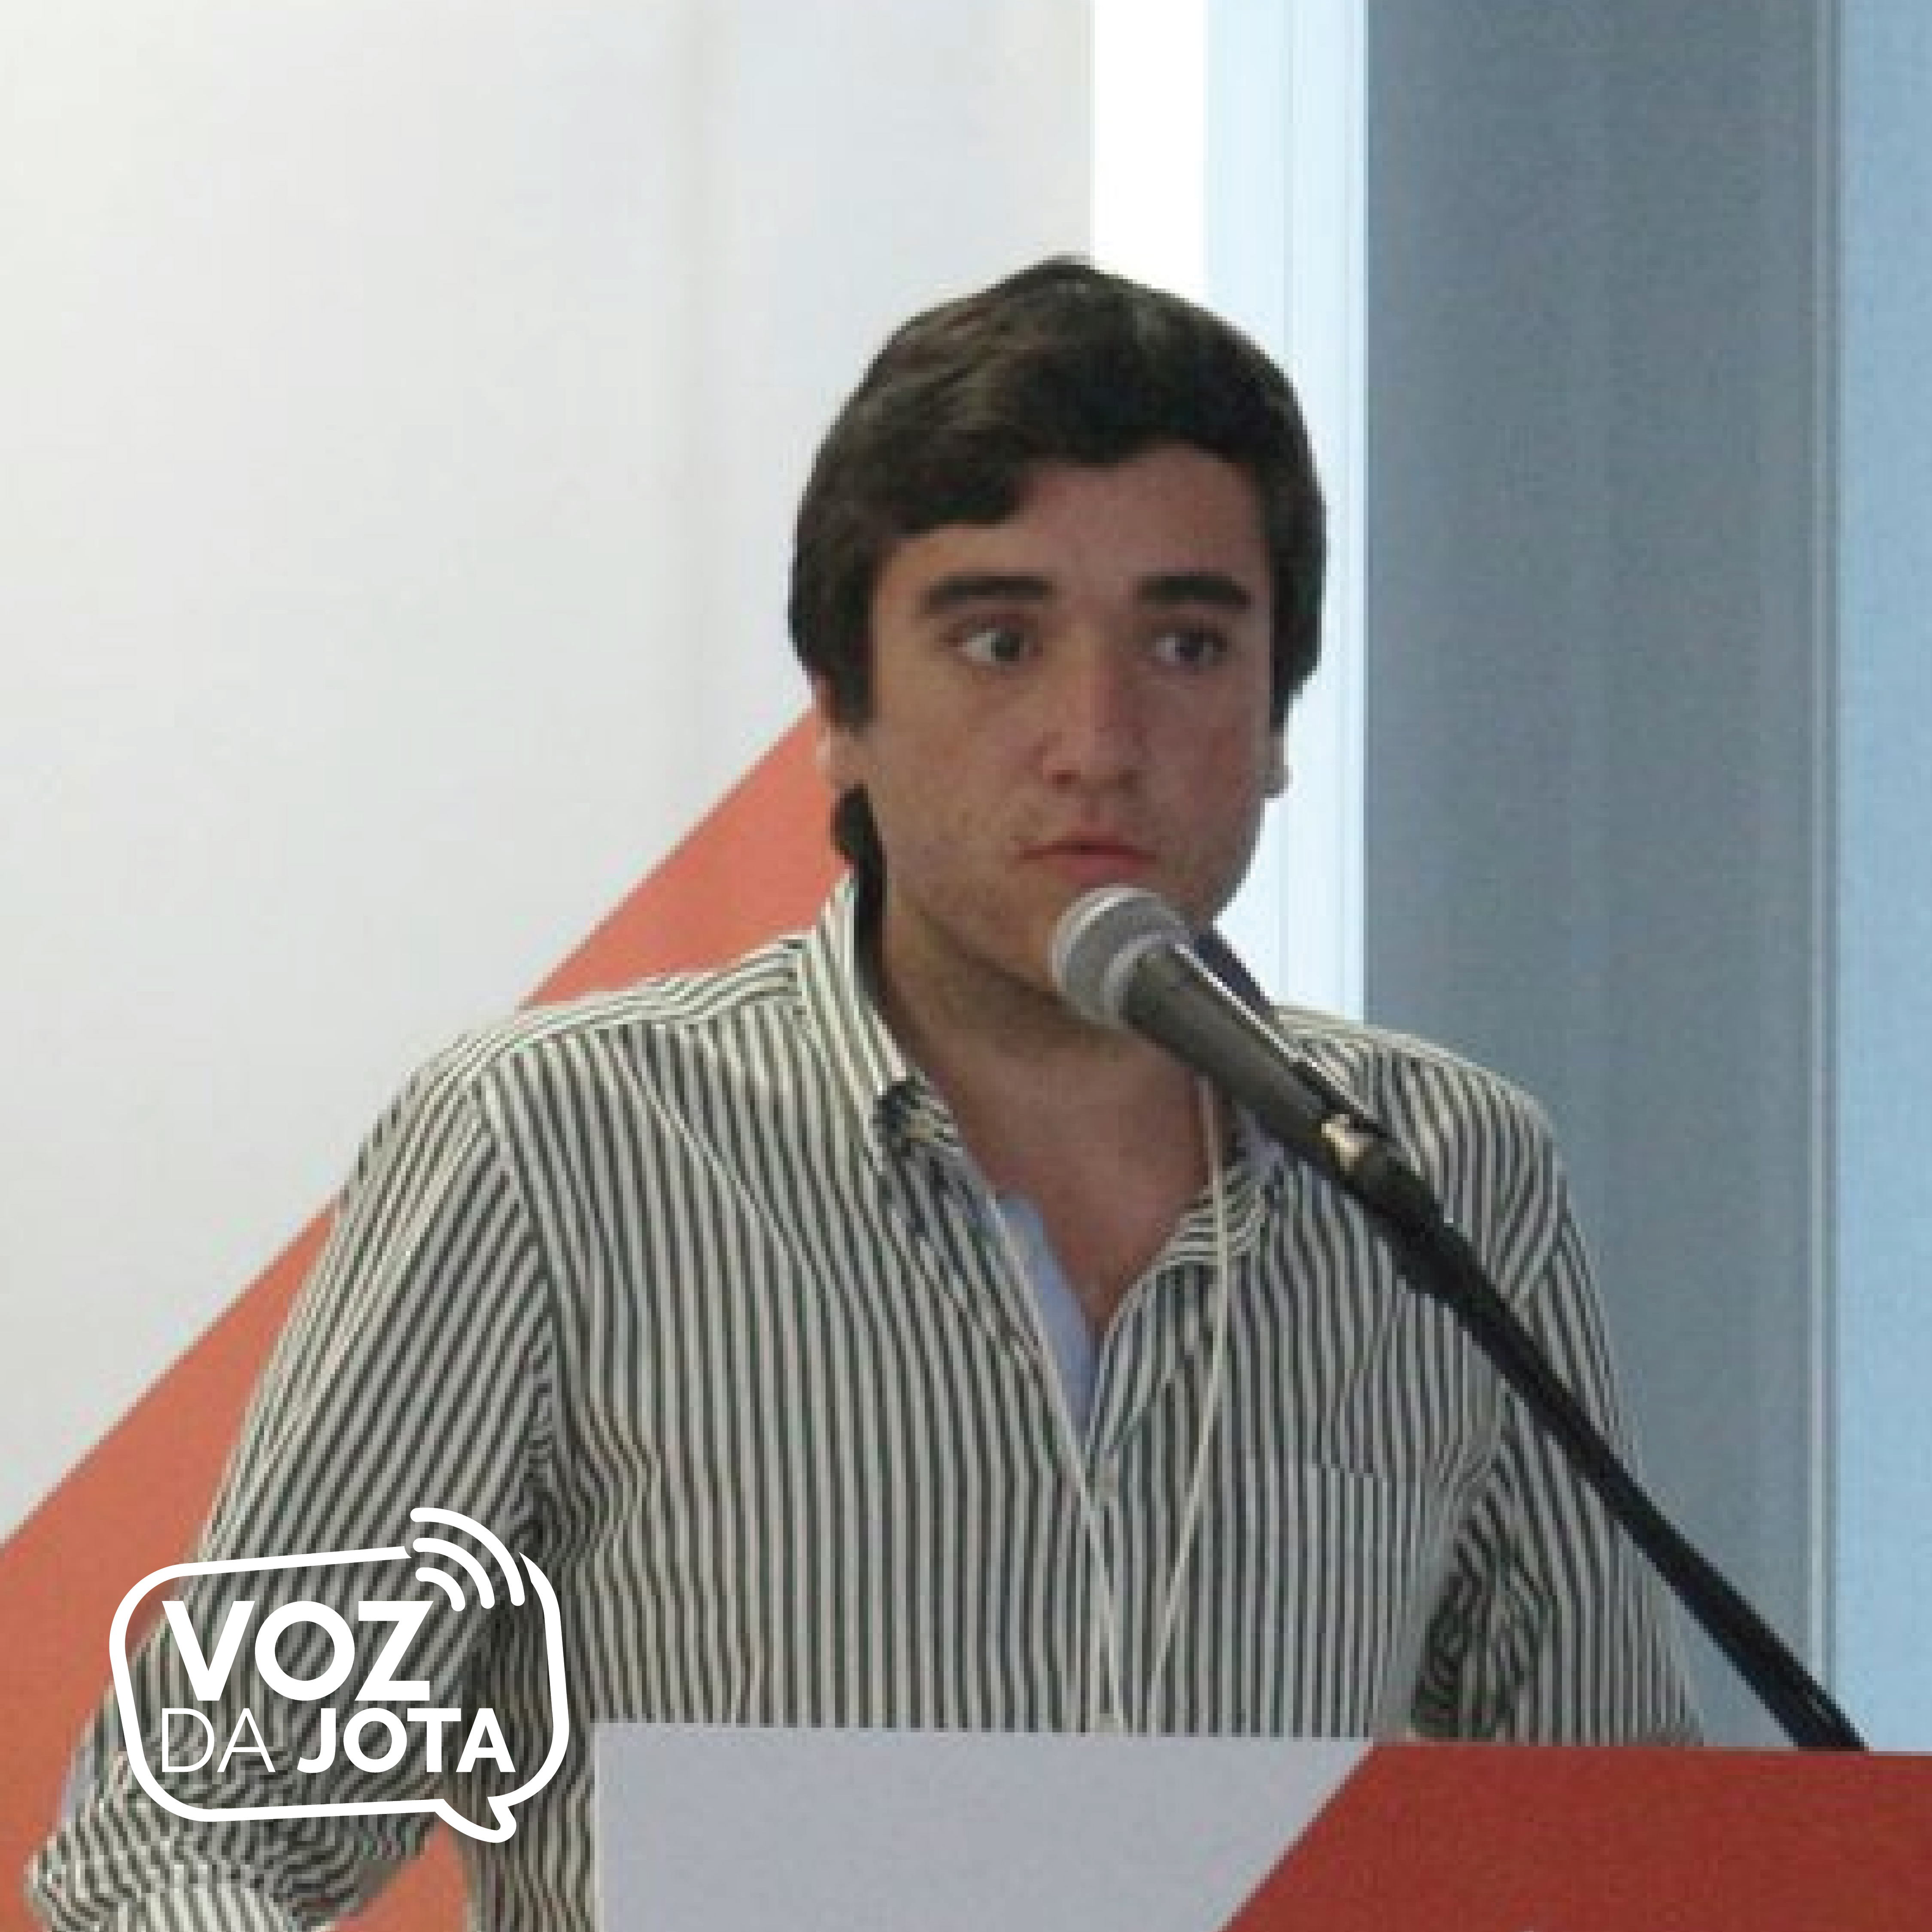 Ricardo_Freitas_vozdajota_site